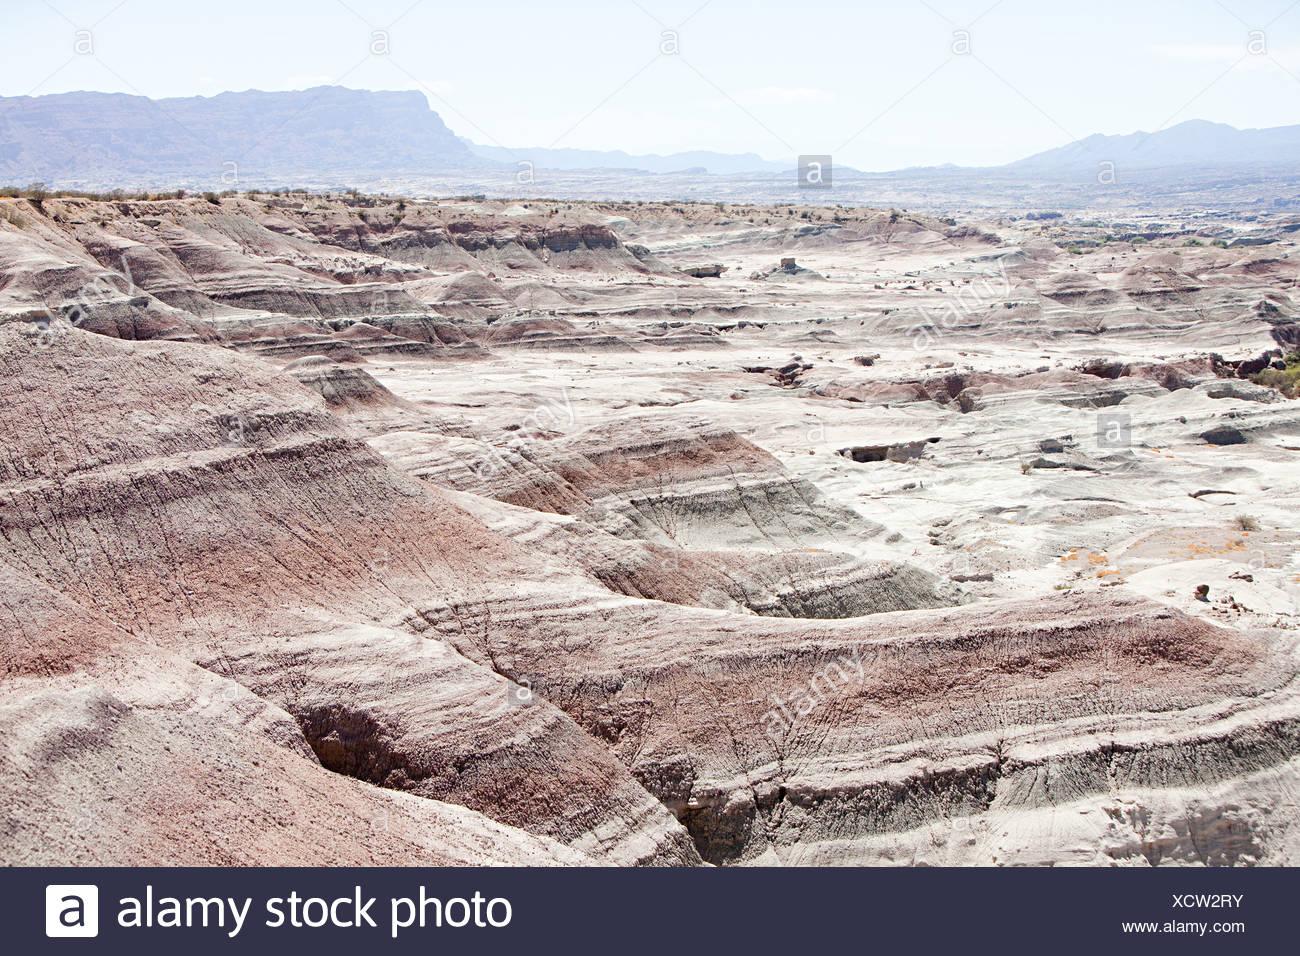 Landscape of rock formations in san juan province of argentina - Stock Image